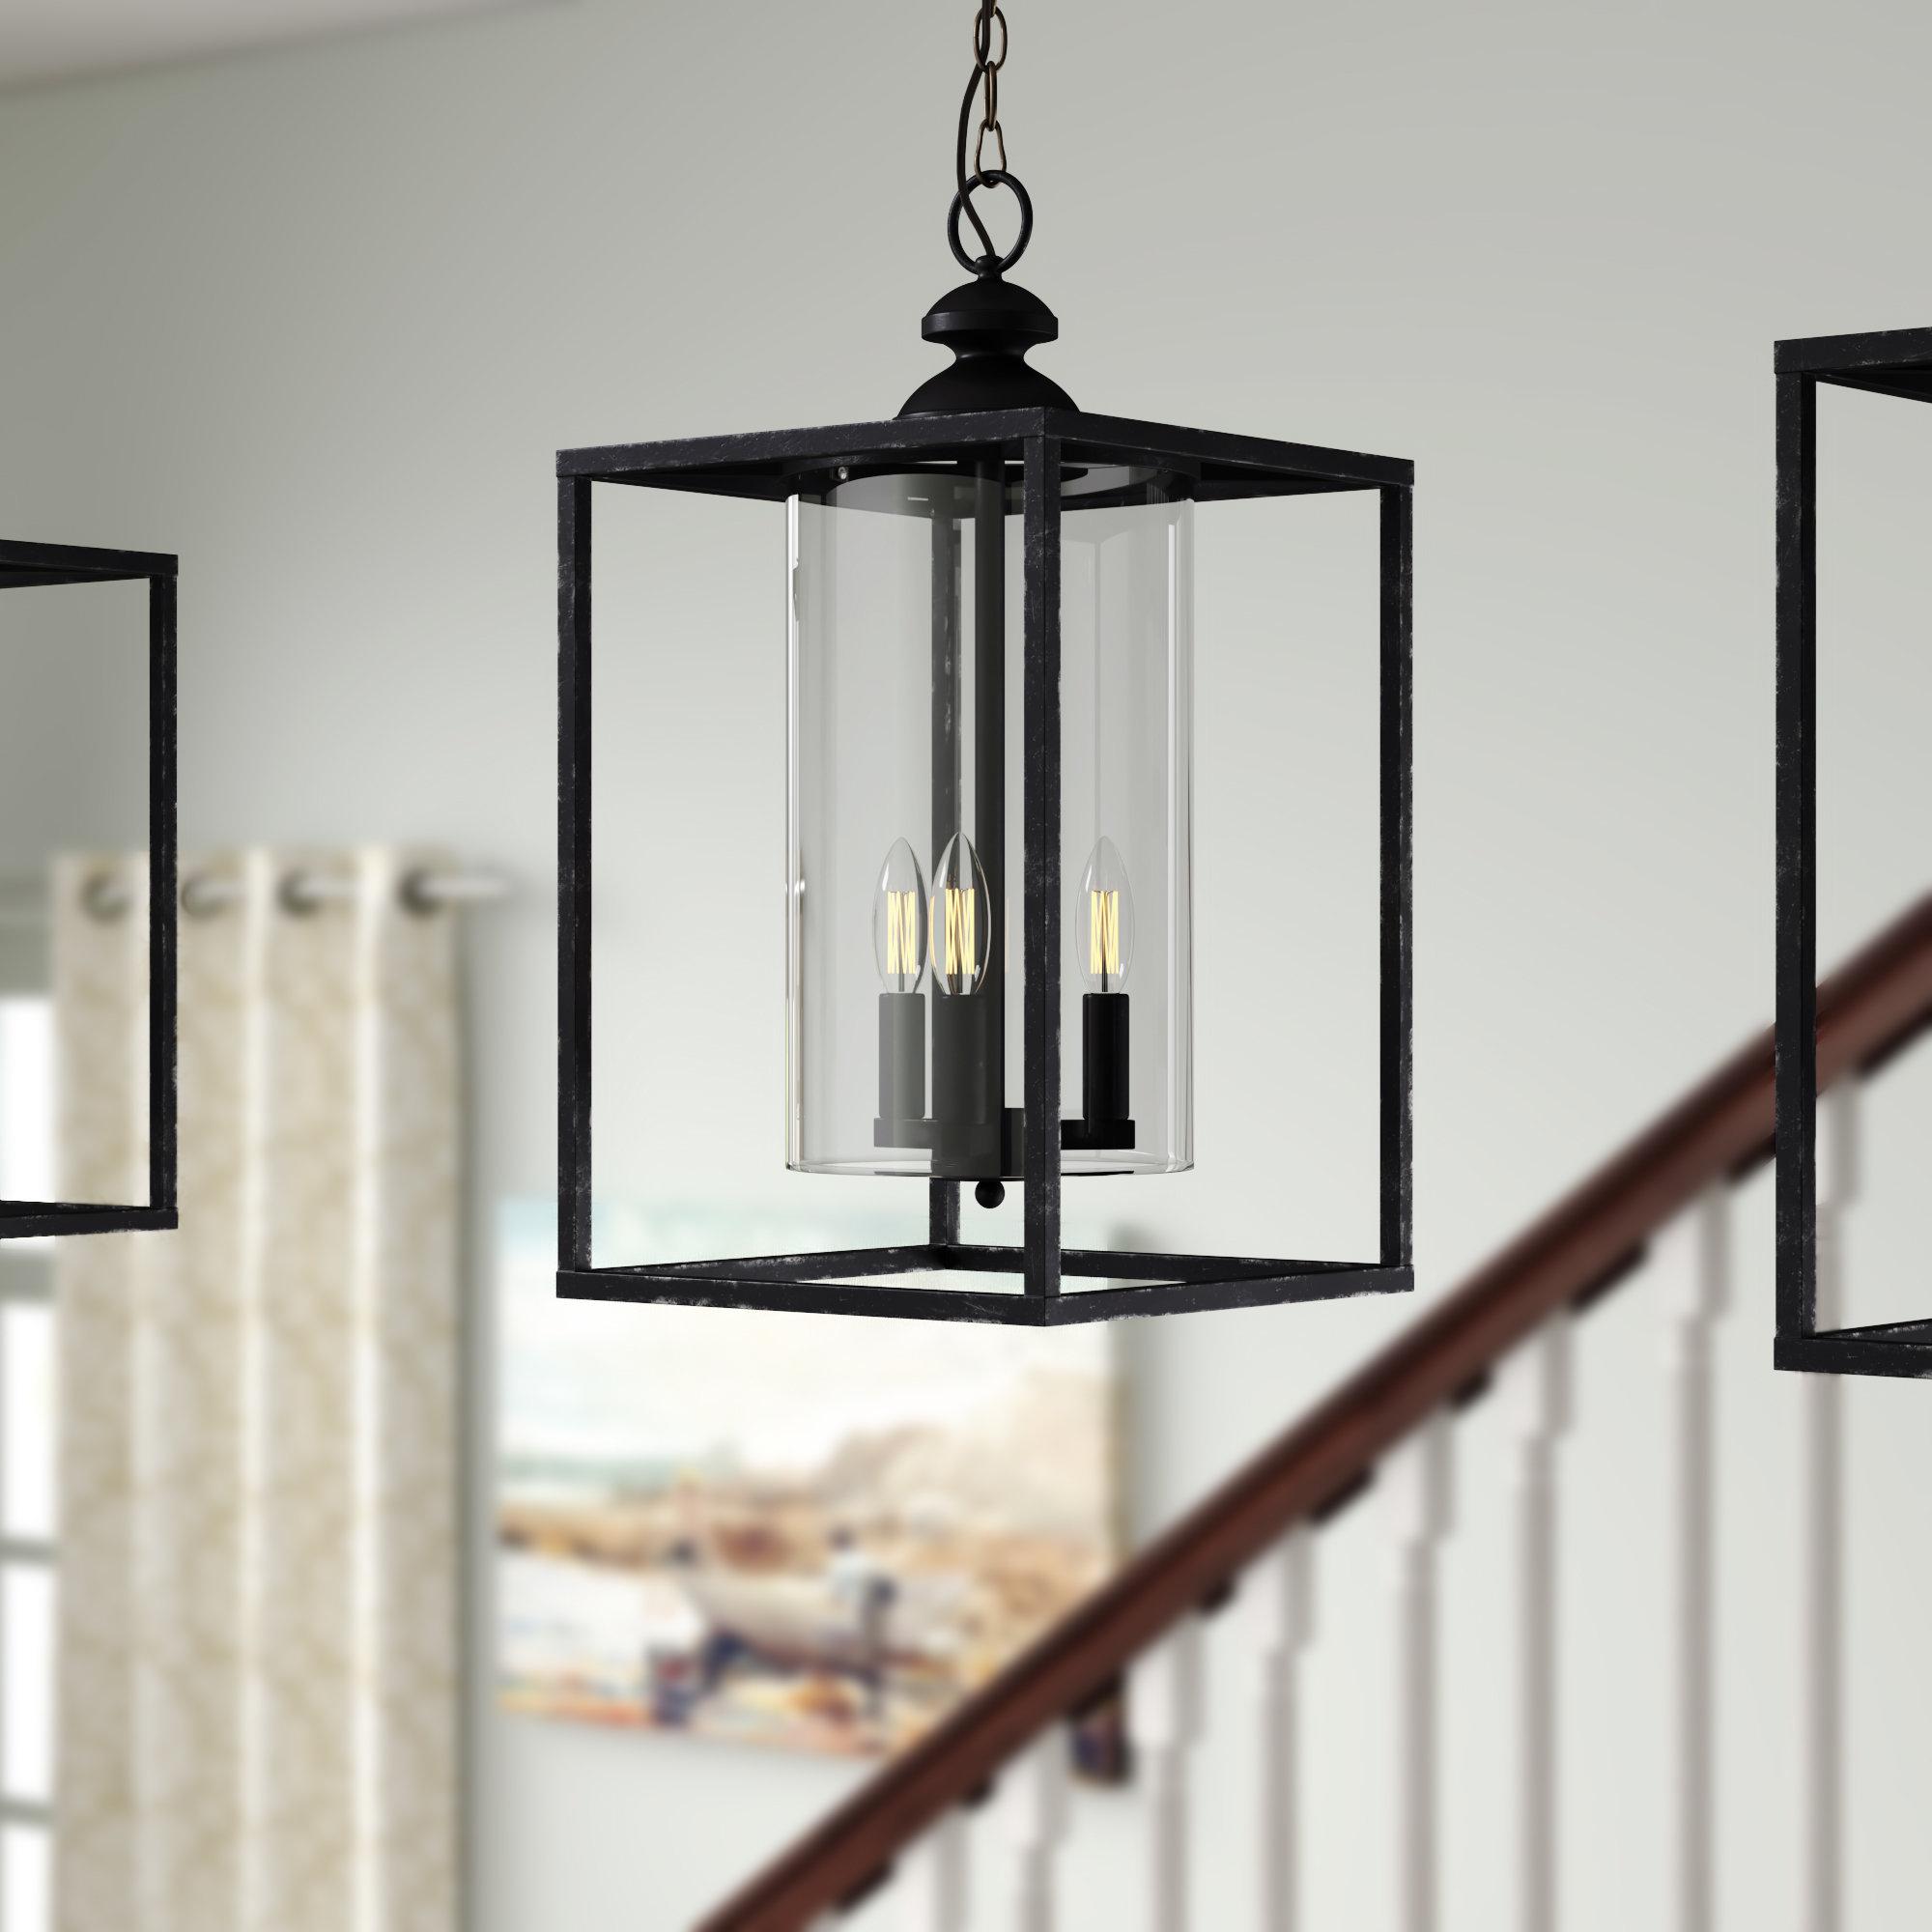 Didmarton 3 Light Square/rectangle Pendant Pertaining To Finnick 3 Light Lantern Pendants (View 15 of 30)